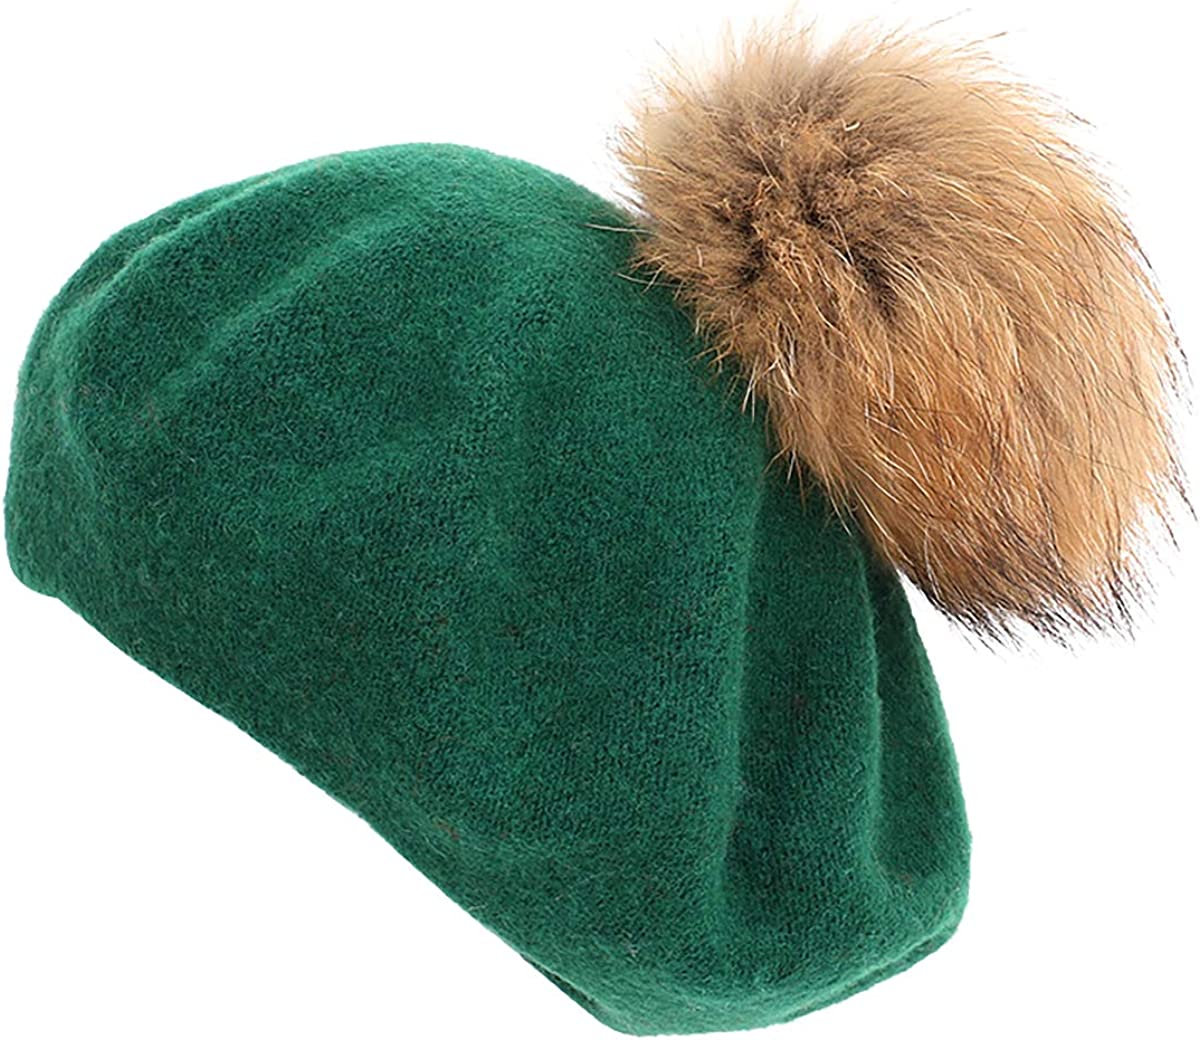 Cozylkx Women Beret Hat, Spring Autumn Pom Pom Beret Beanie Cap for Ladies